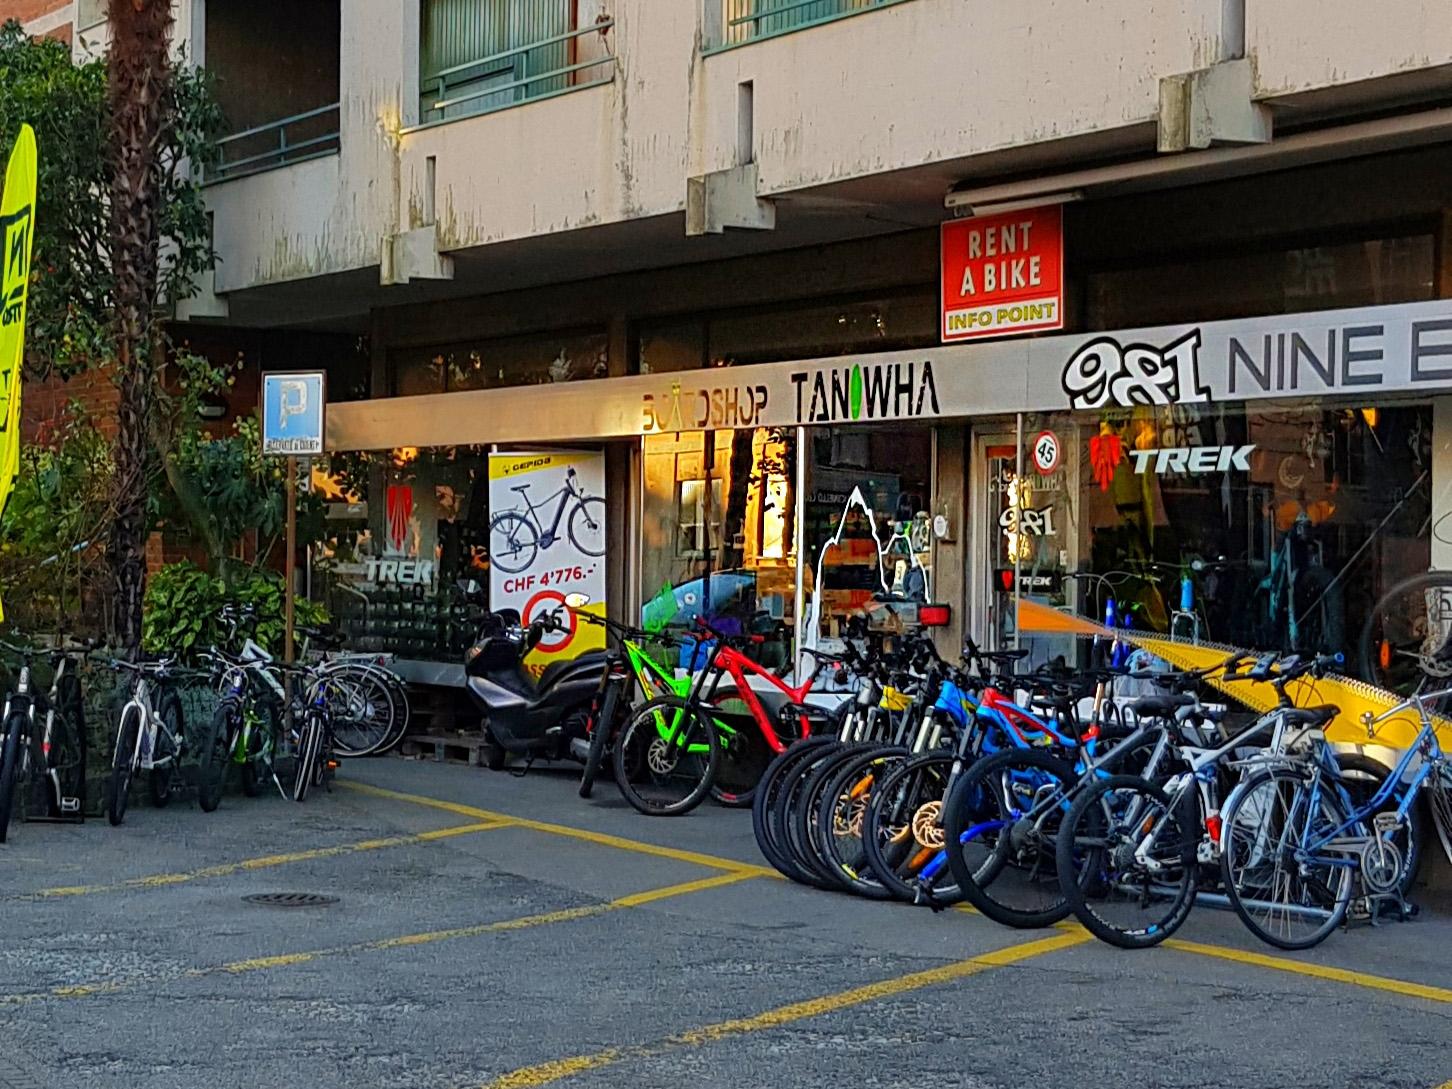 981 Bike Shop di Claudio Tanadini